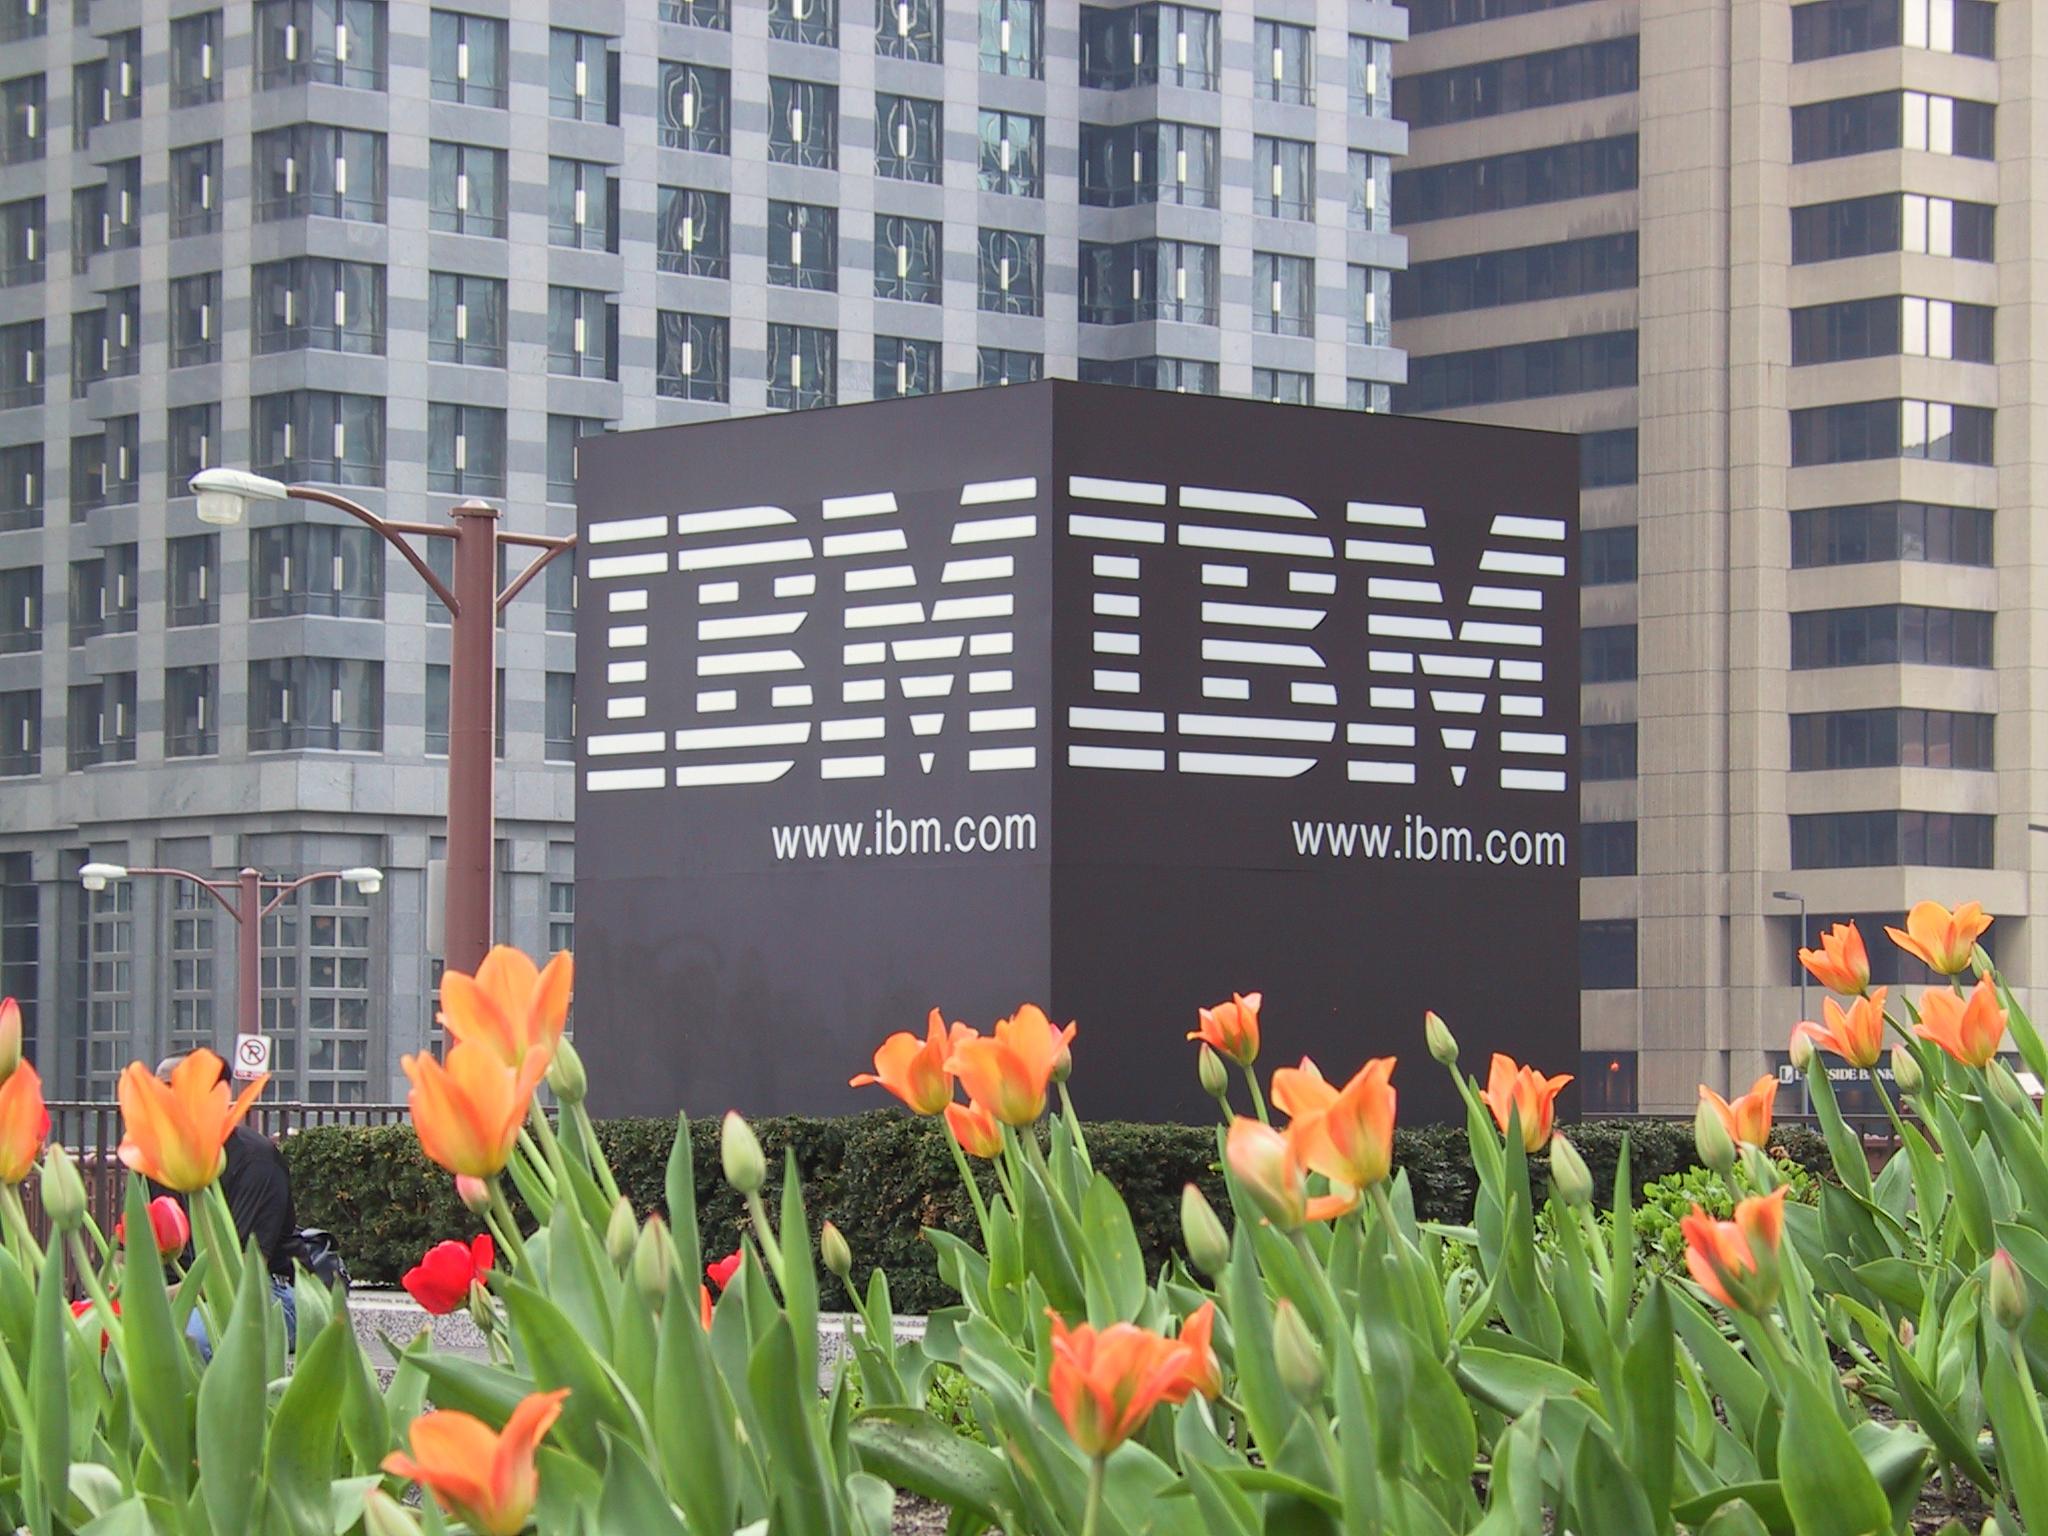 IBM sign Alfred Lui Flickr